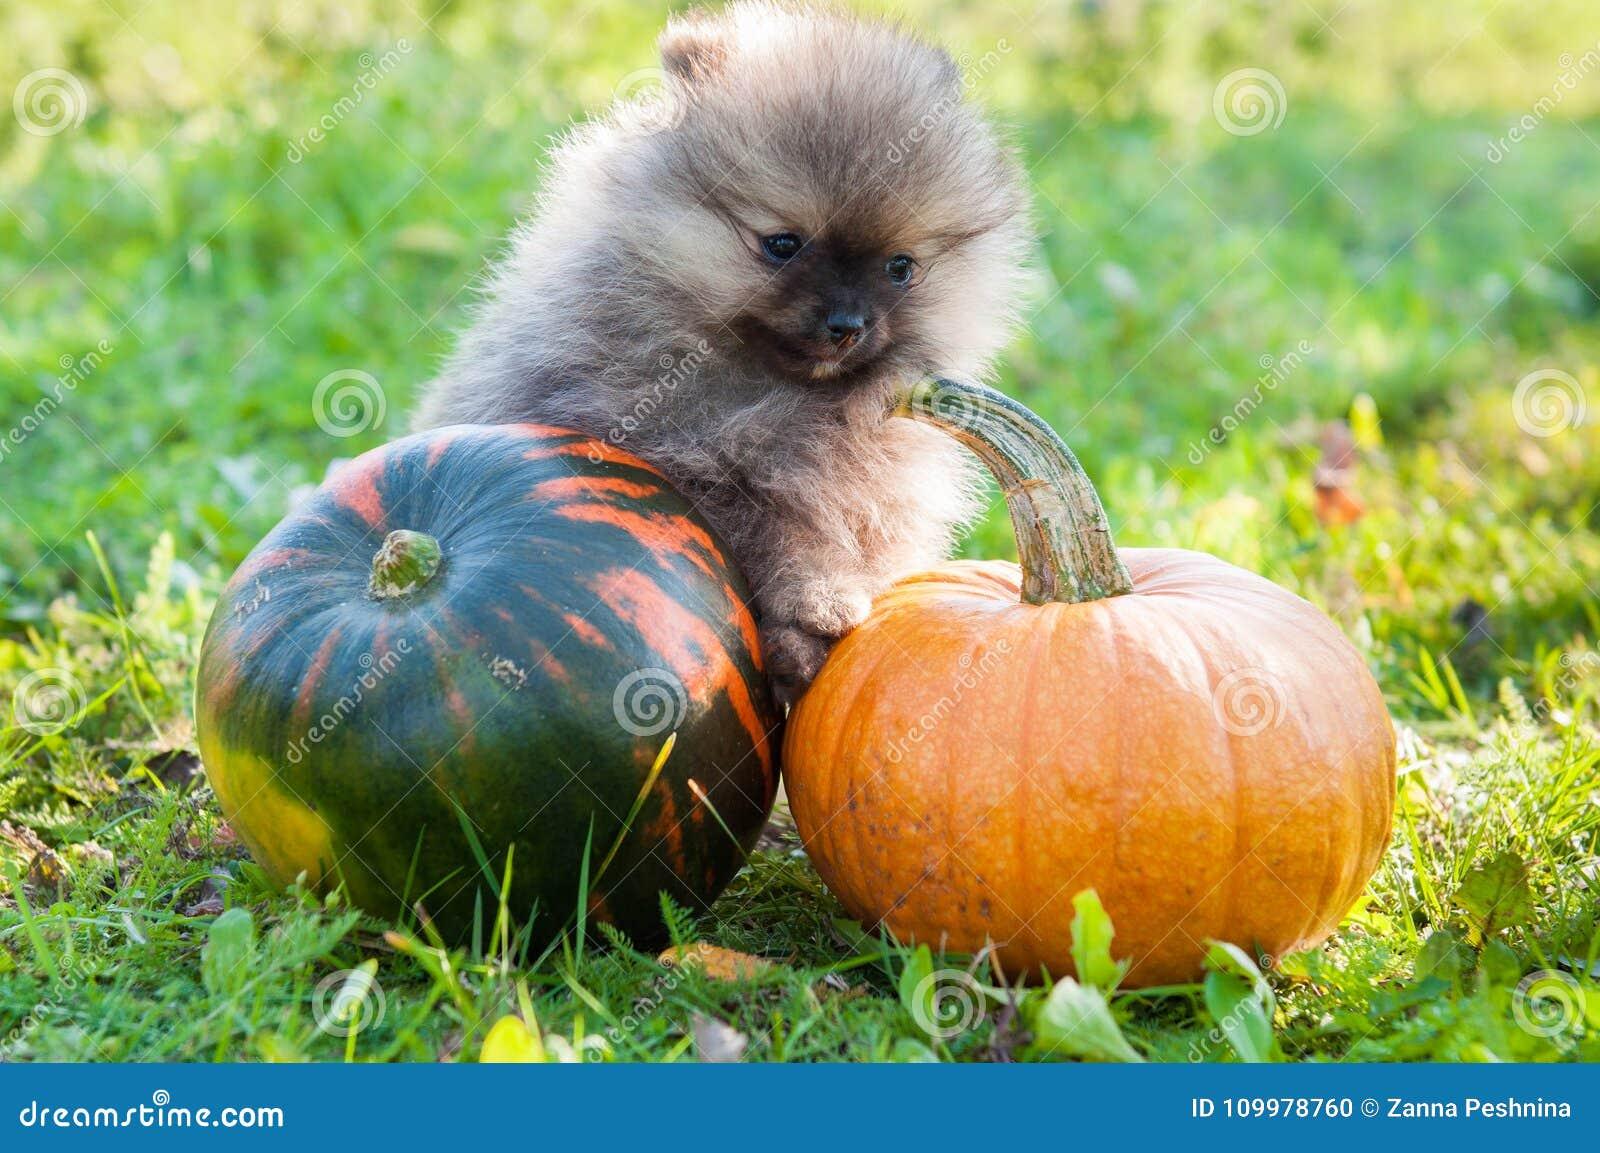 pomeranian dog and pumpkin, halloween stock photo - image of idea